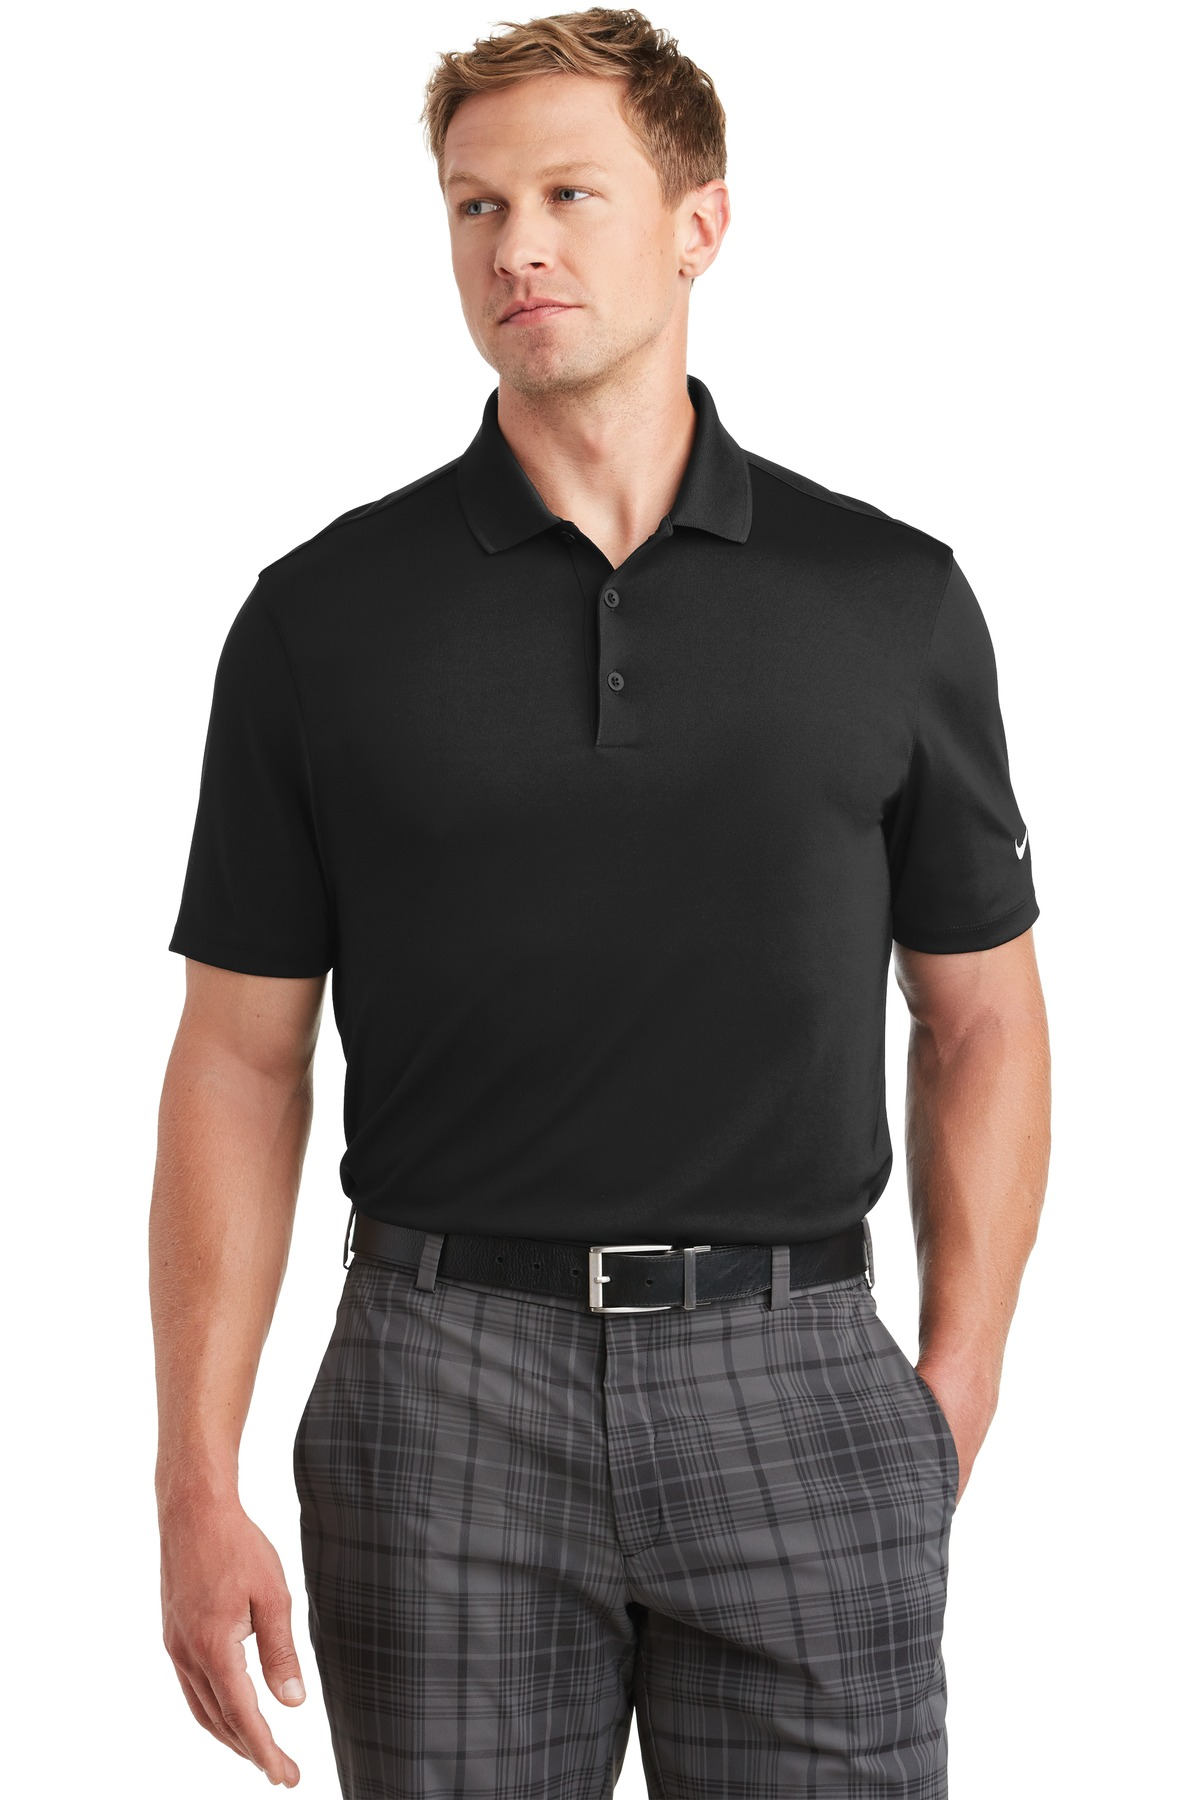 705342876-120 - Nike Golf Dri-FIT Players Polo w/ Flat Knit Collar - thumbnail